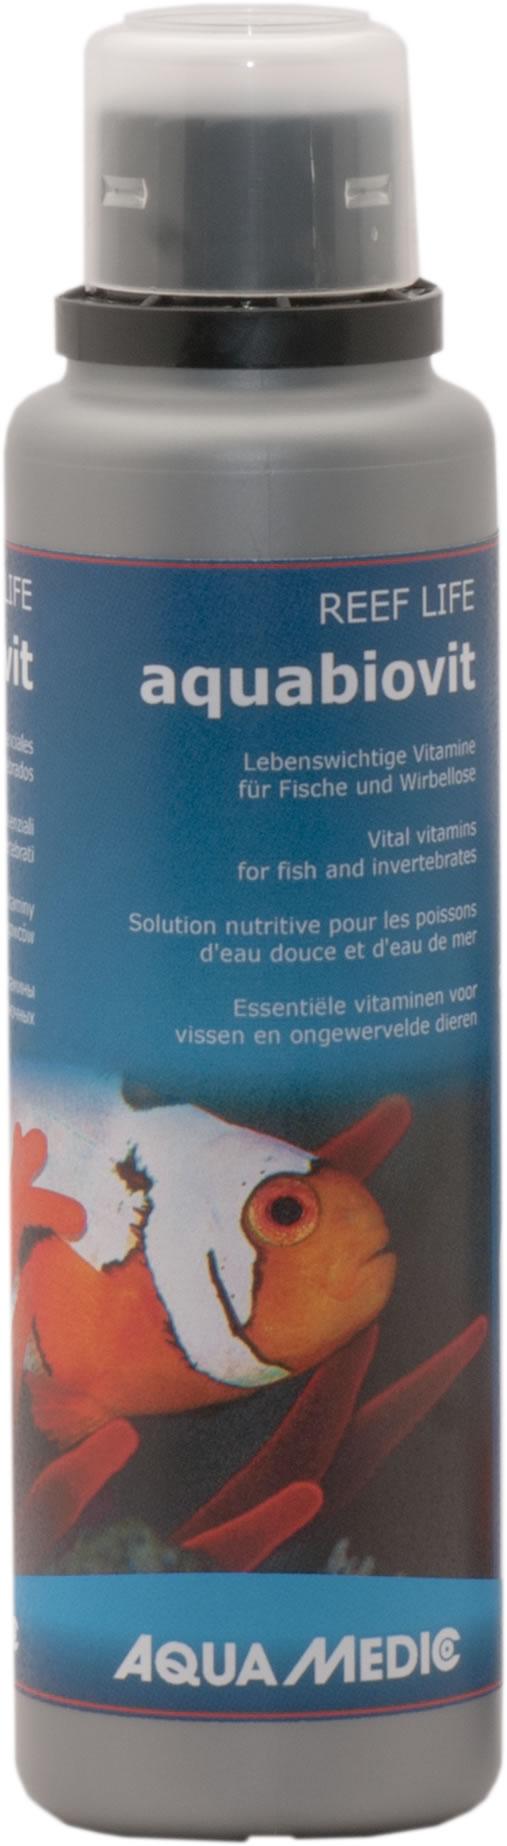 Aqua Medic REEF LIFE aquabiovit